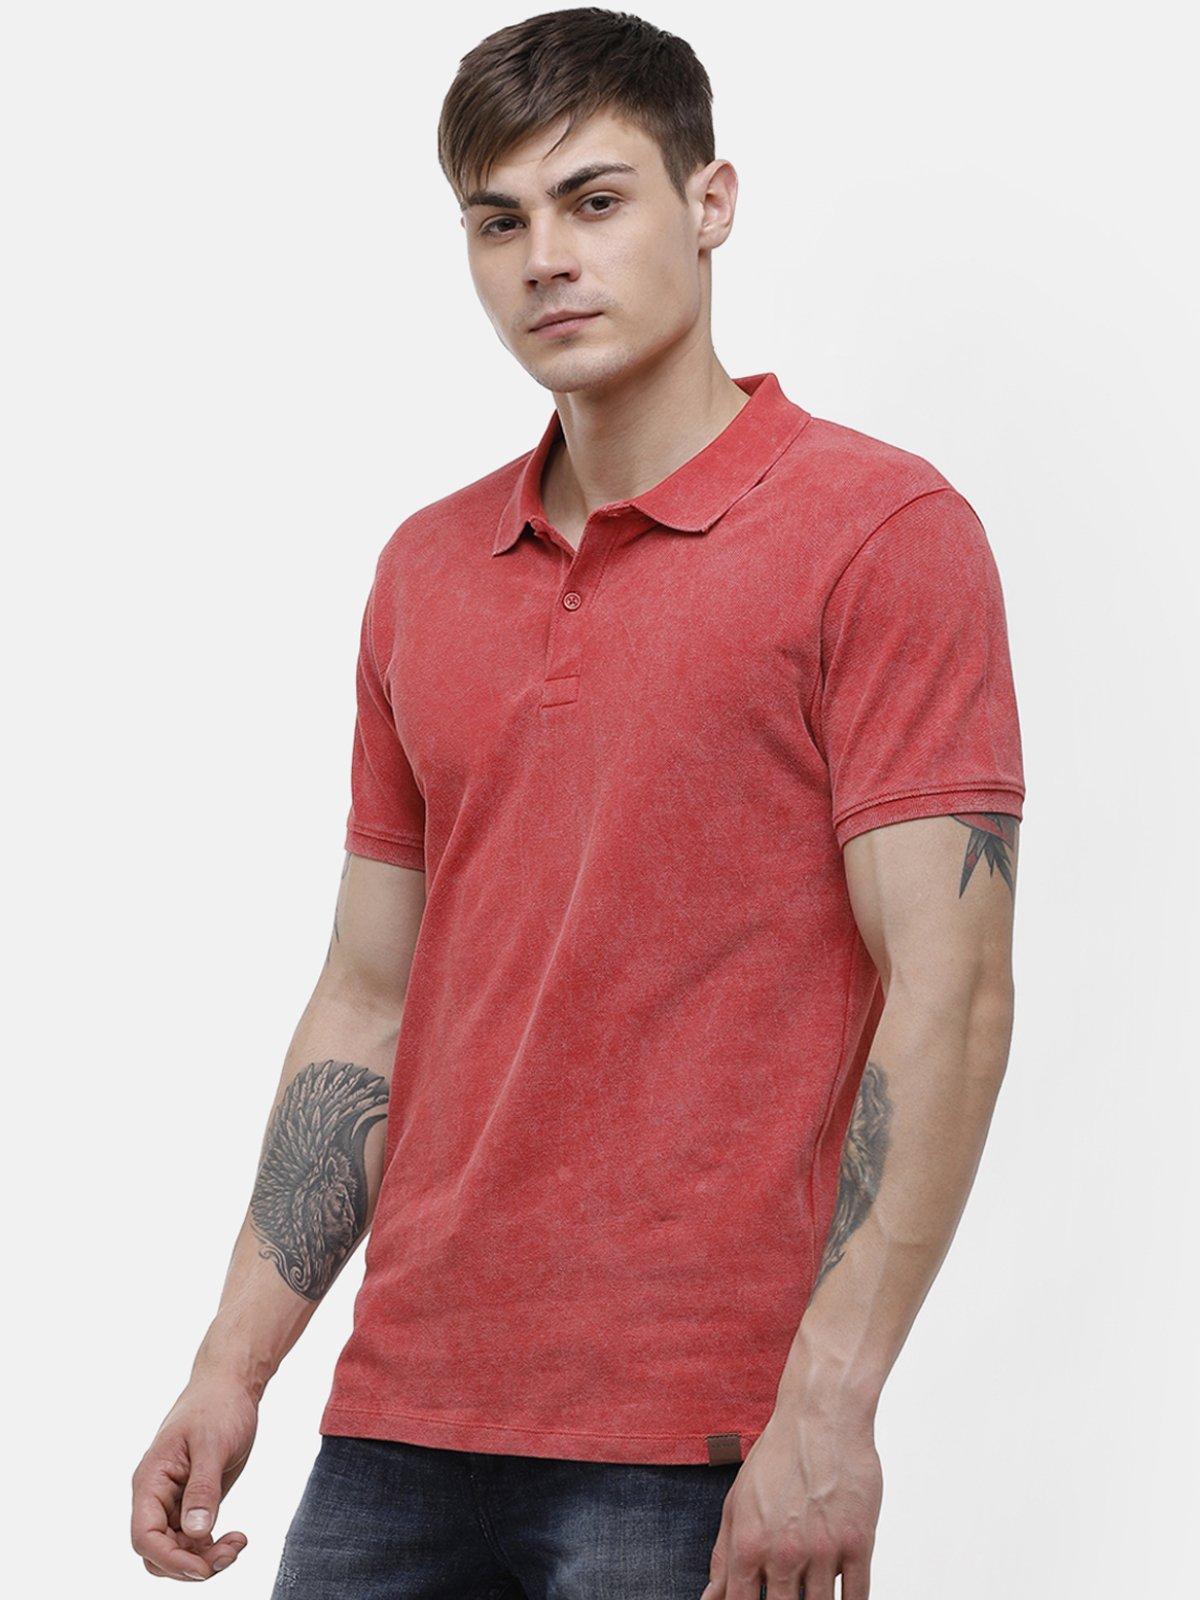 Voi Jeans | Red T-Shirt ( VOTS1575)